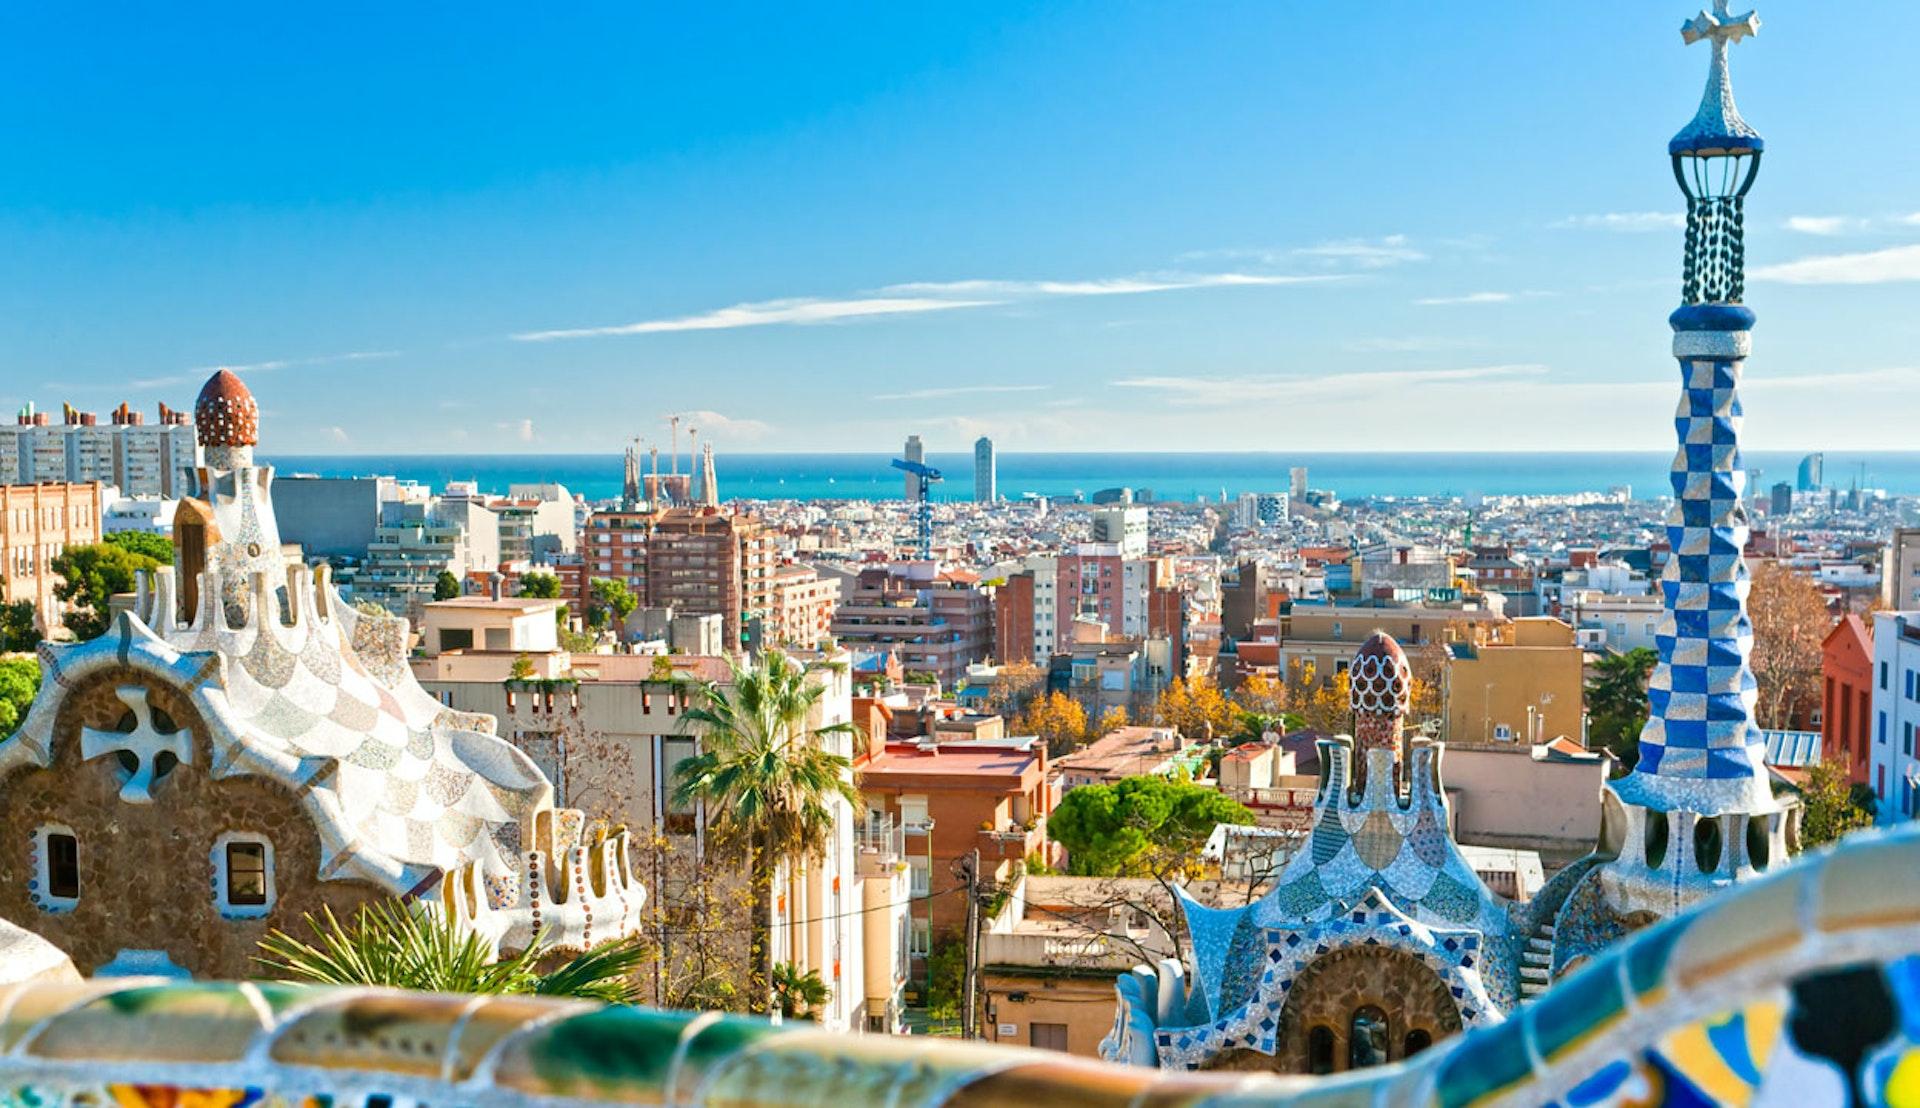 Solig vy över Barcelona i Spanien.